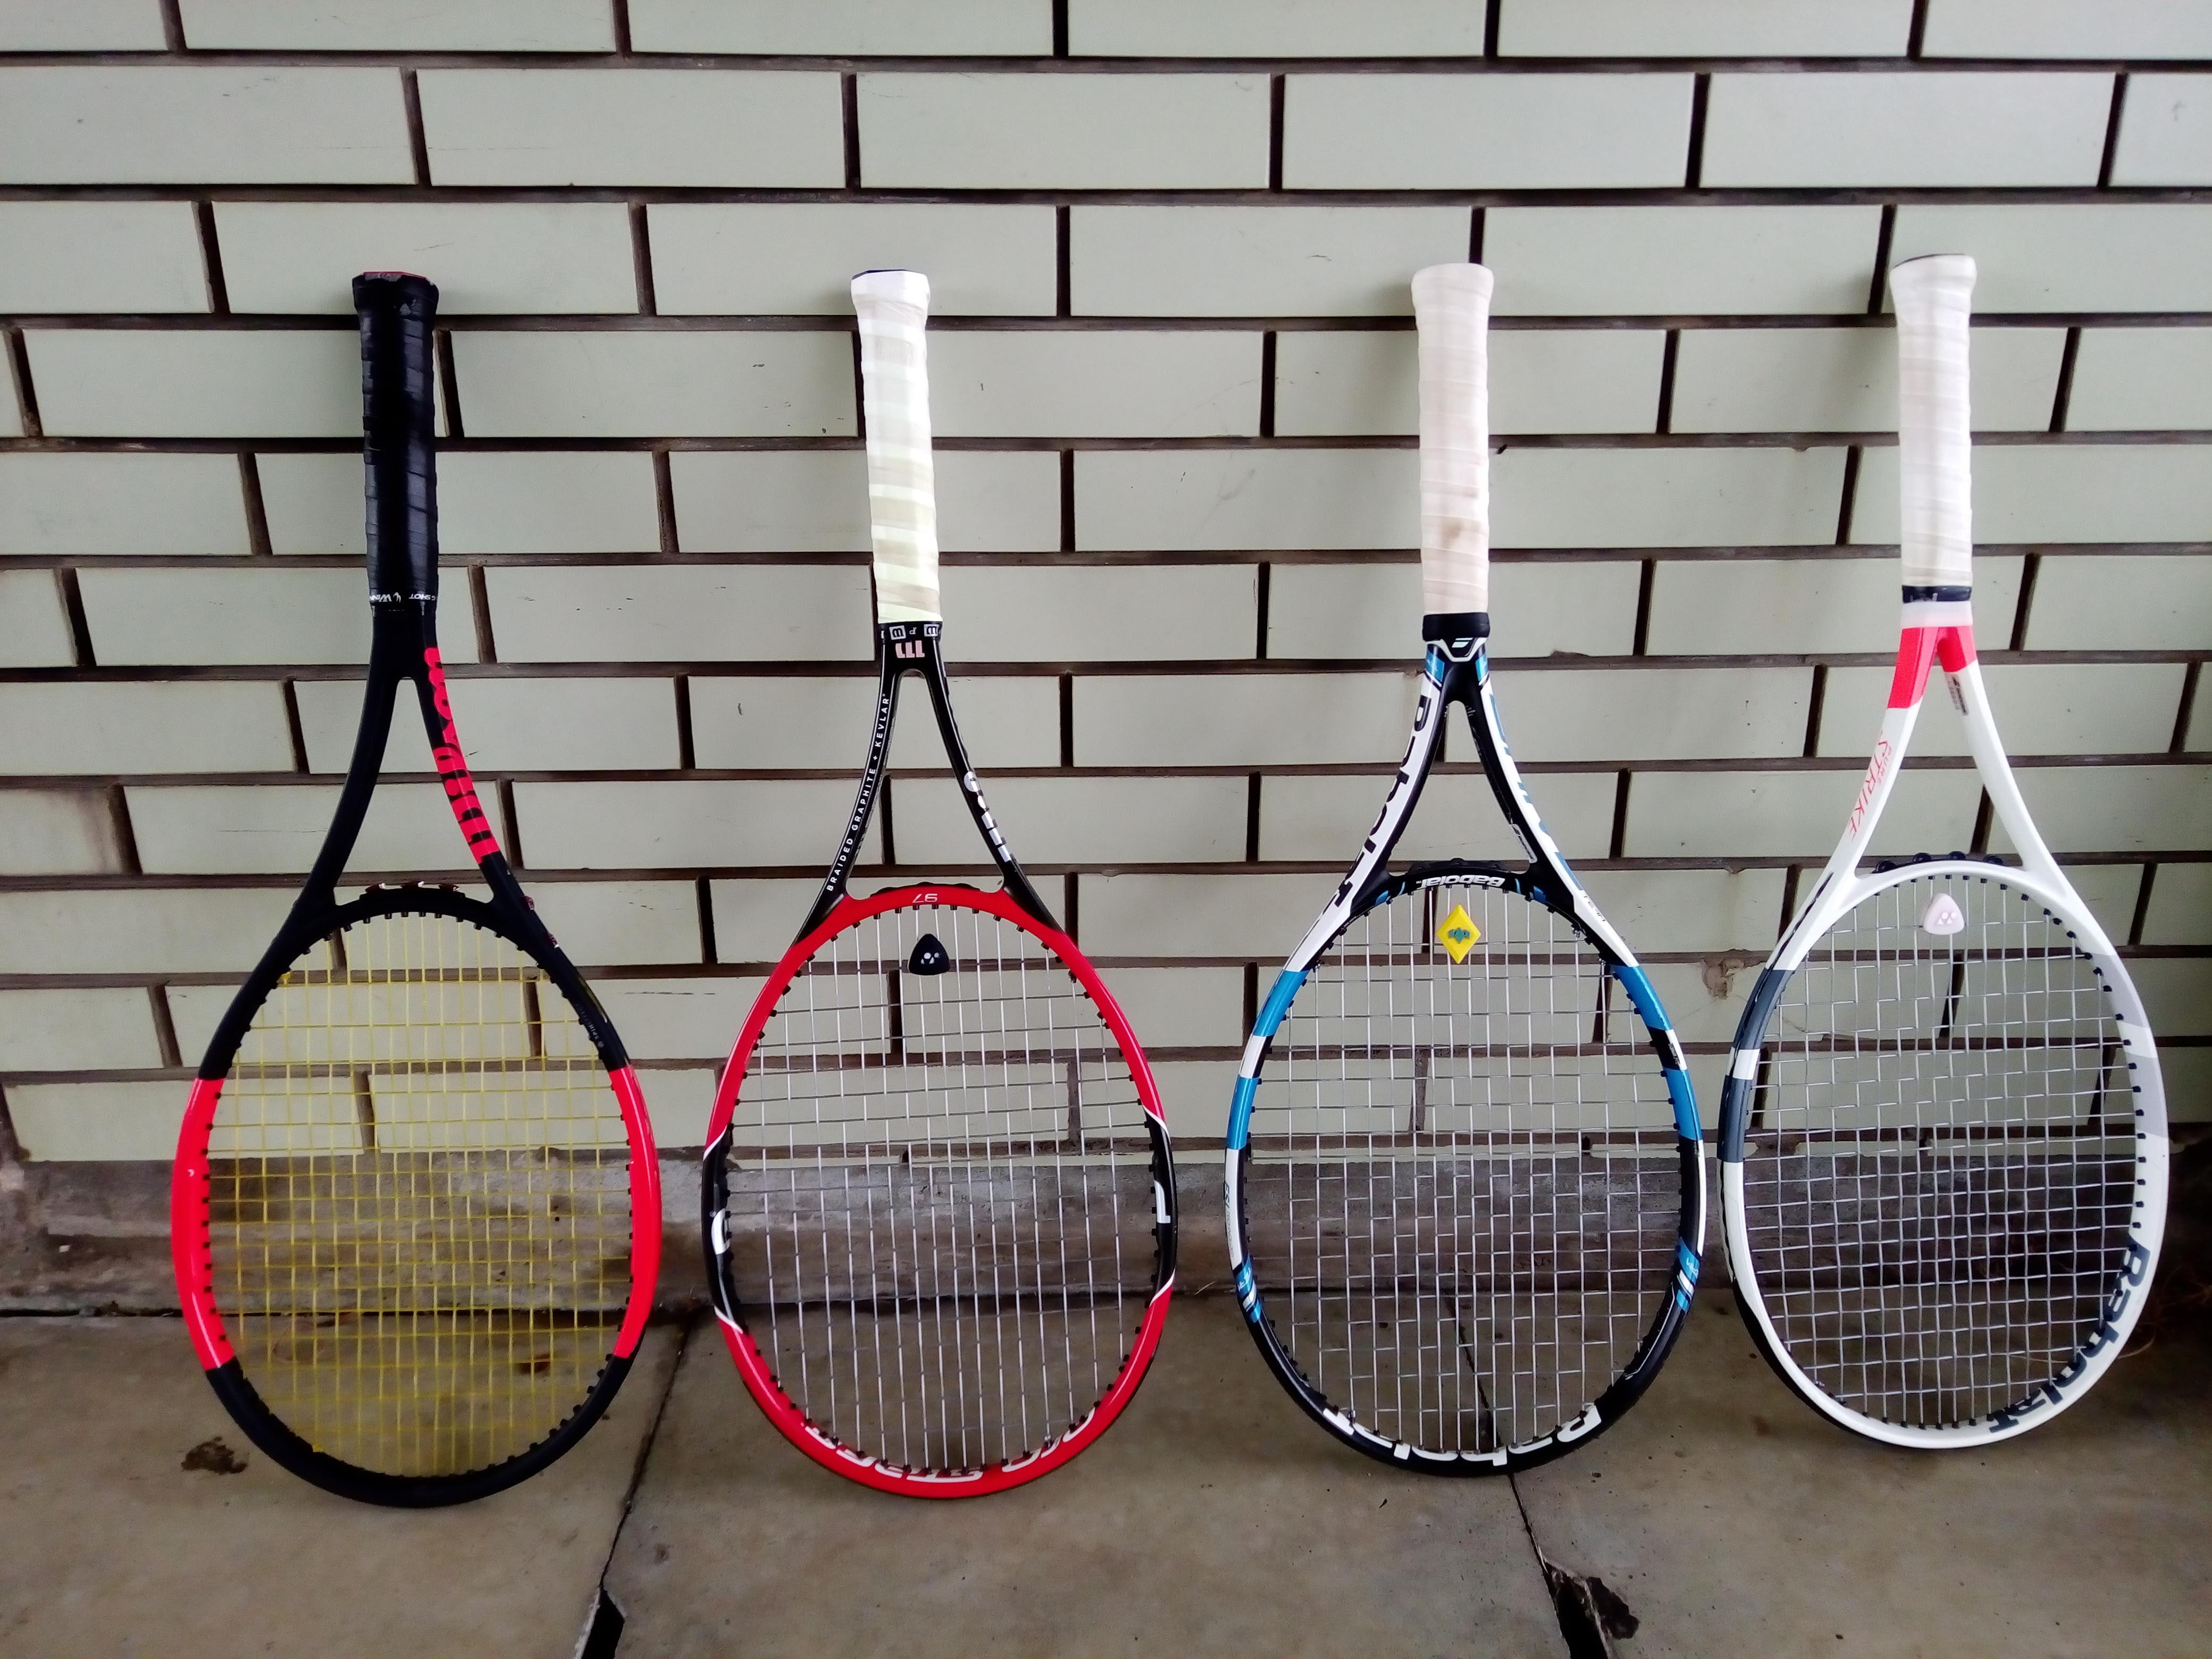 enjoy choosing a tennis racket